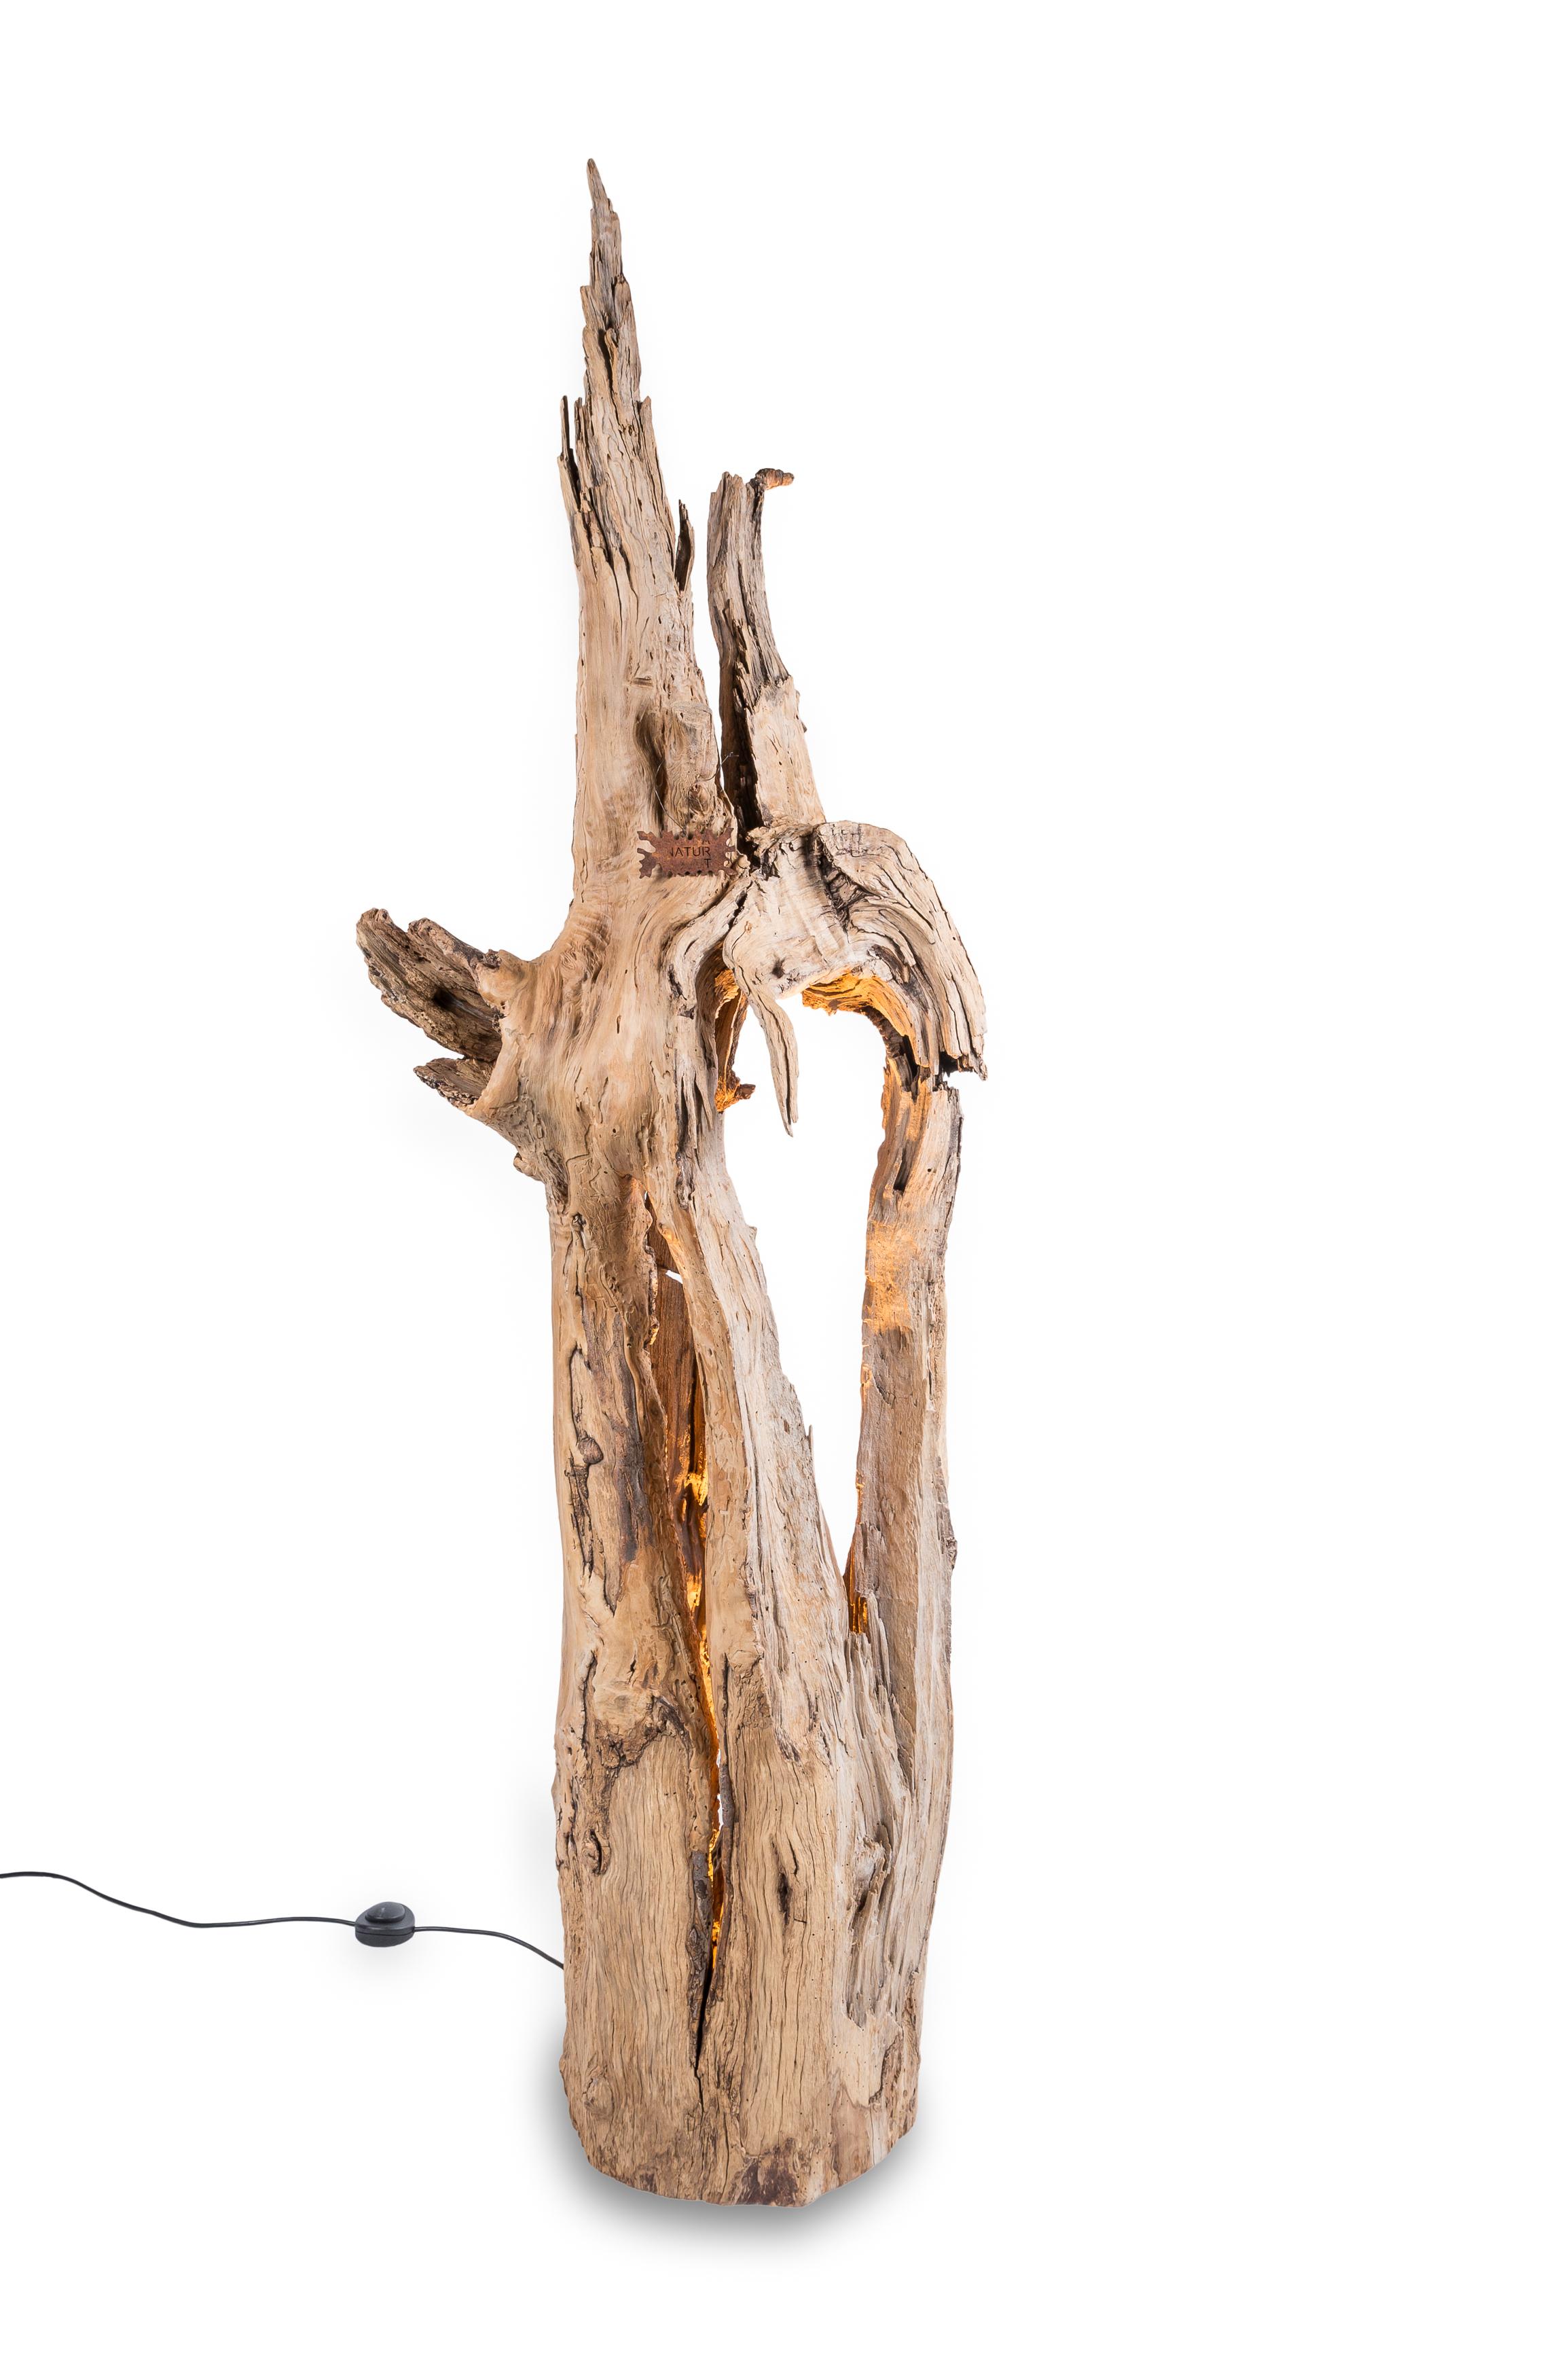 naturart – neue Werke